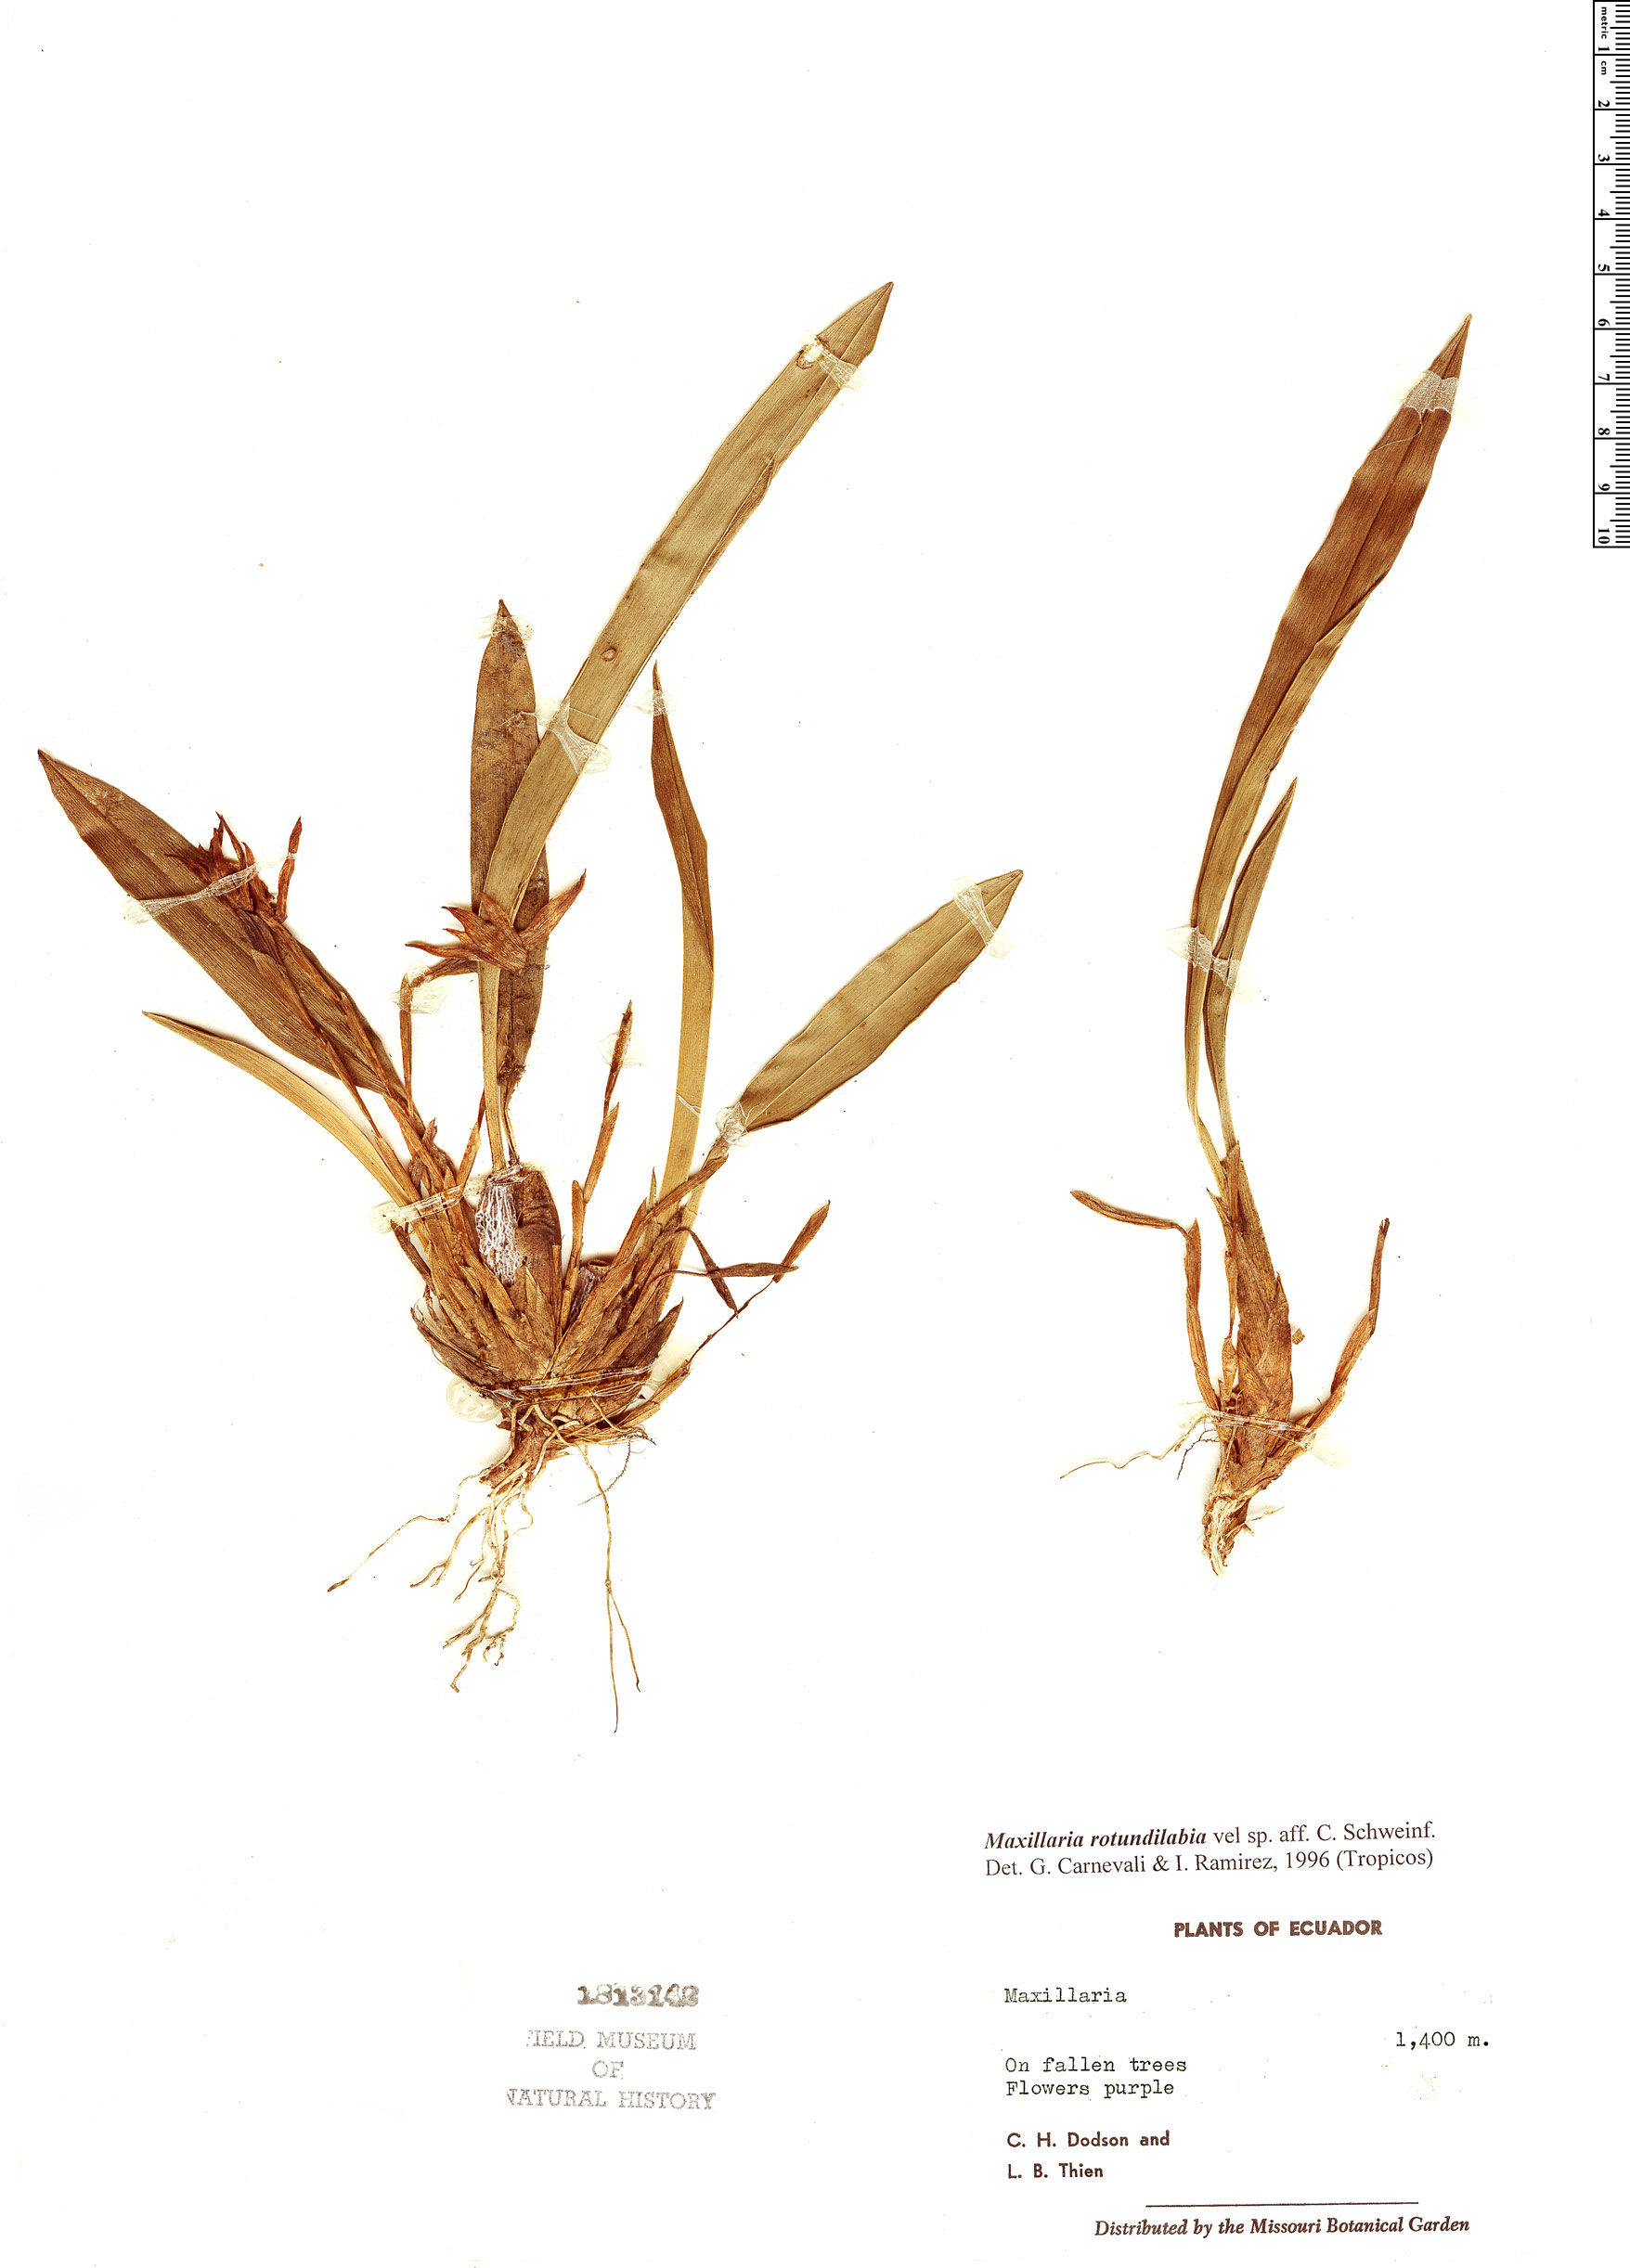 Specimen: Maxillaria rotundilabia